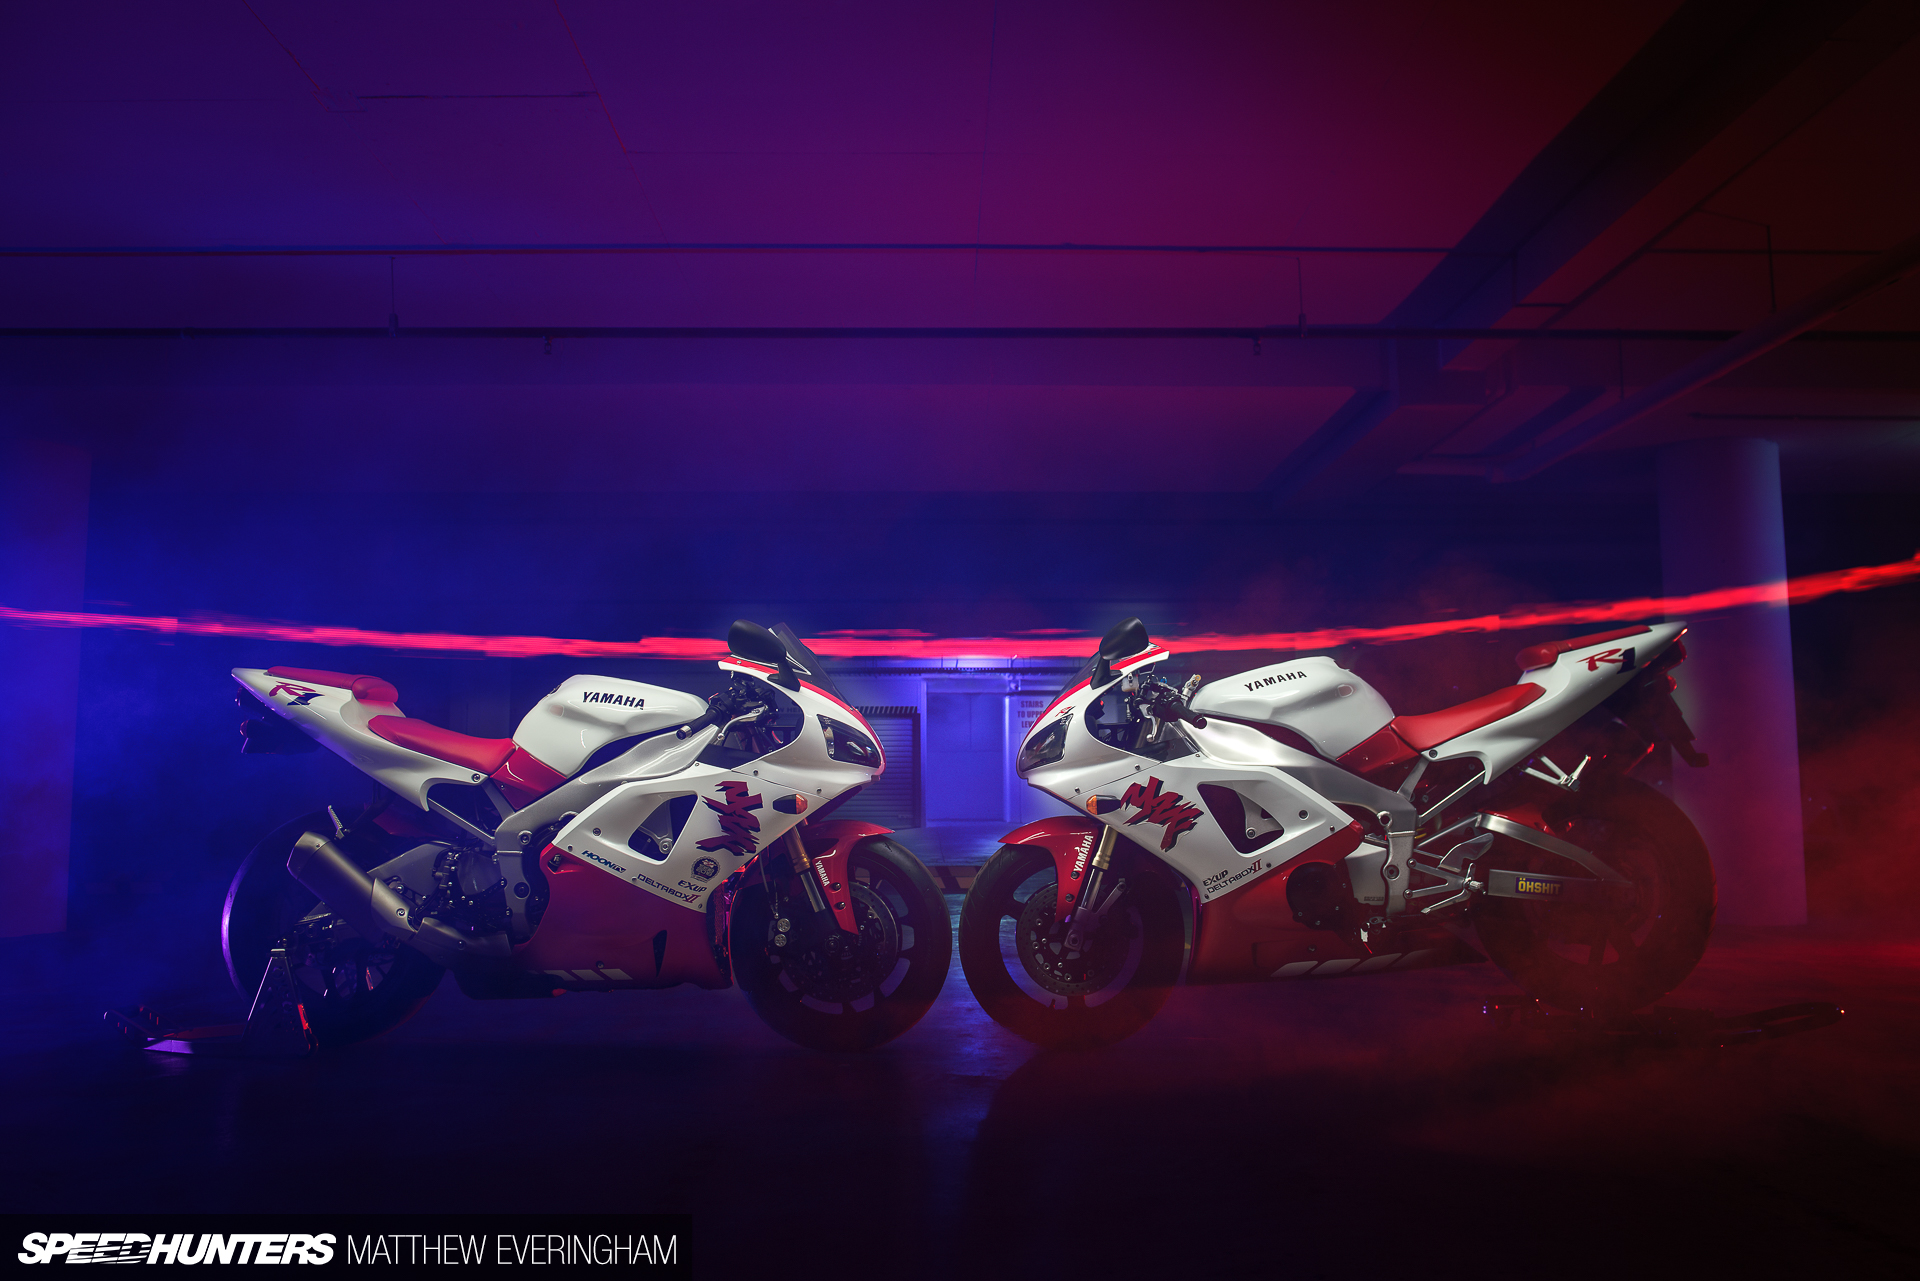 Yamaha 1000 R1 ... - Page 10 Yamaha-R1-20th-Anniversary-Boxer-Matthew-Everingham-Speedhunters-5